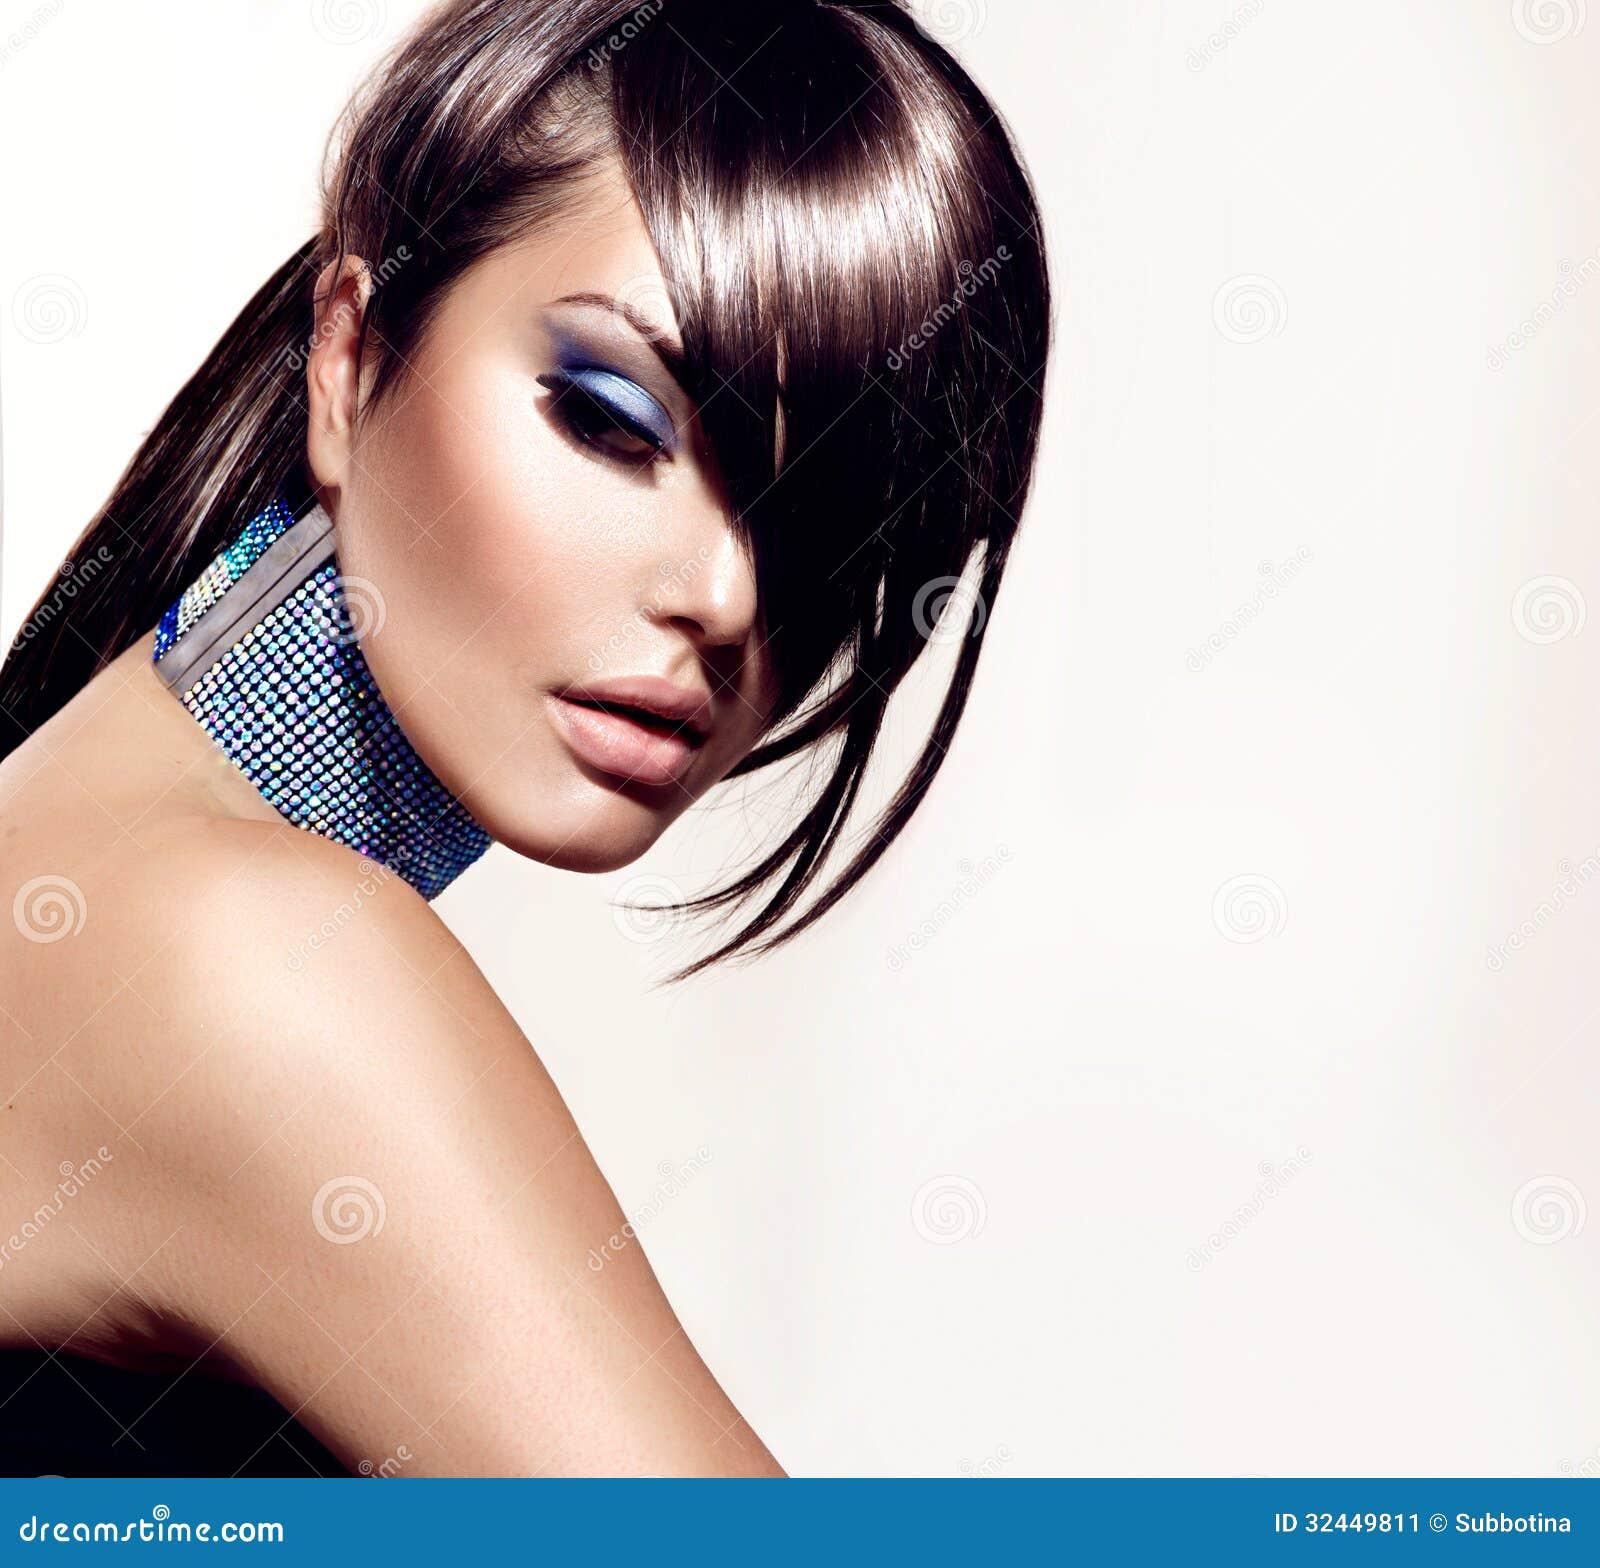 latest fashion beauty pictorial Enjoy